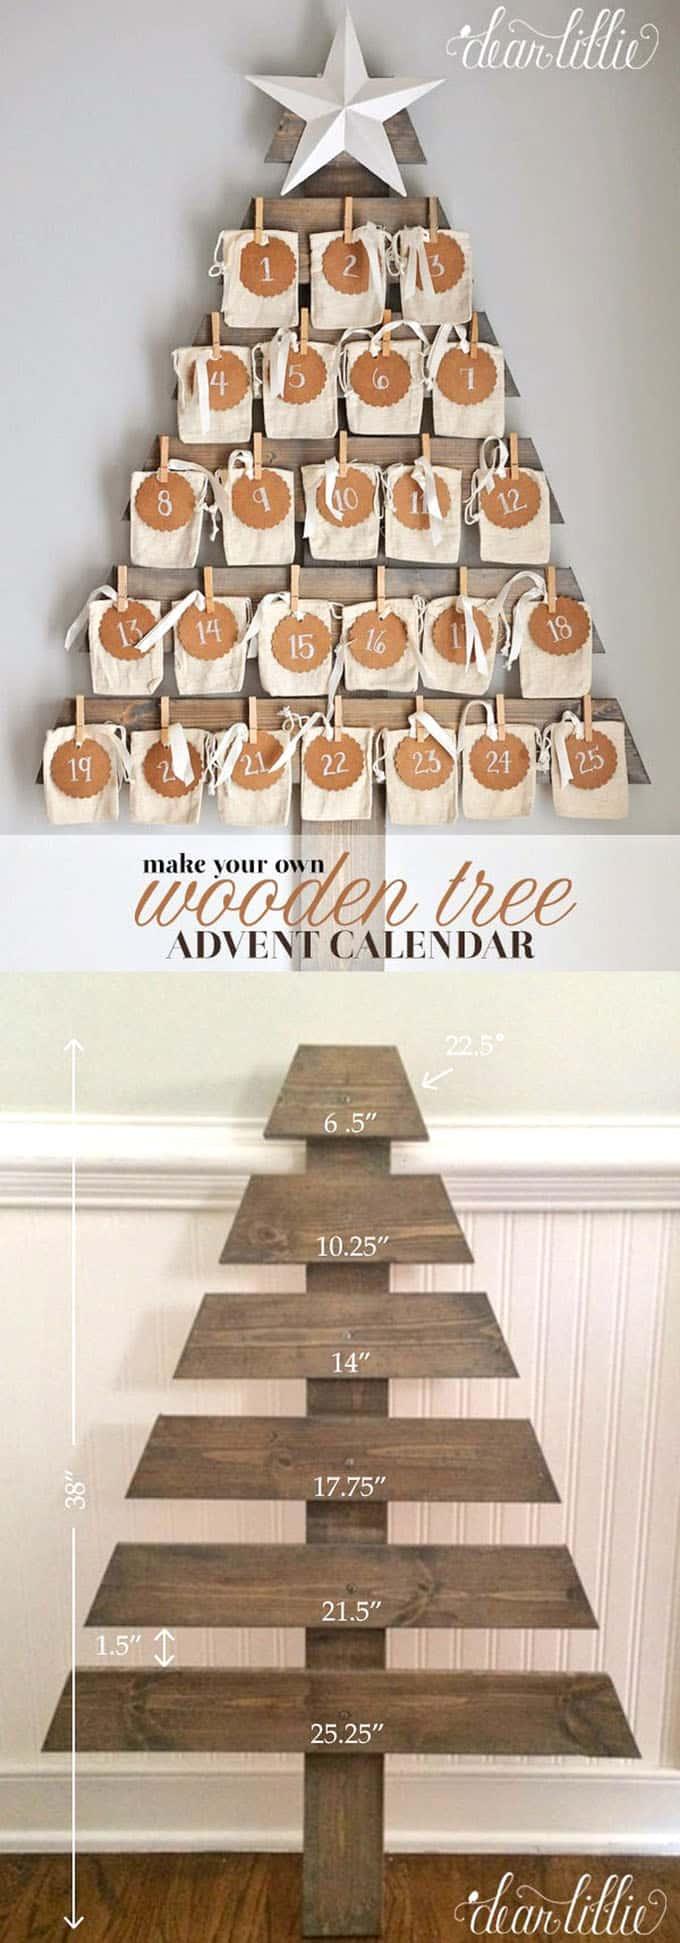 diy christmas tree ideas apieceofrainbow 8 - 48 Amazing Alternative Christmas Tree Ideas